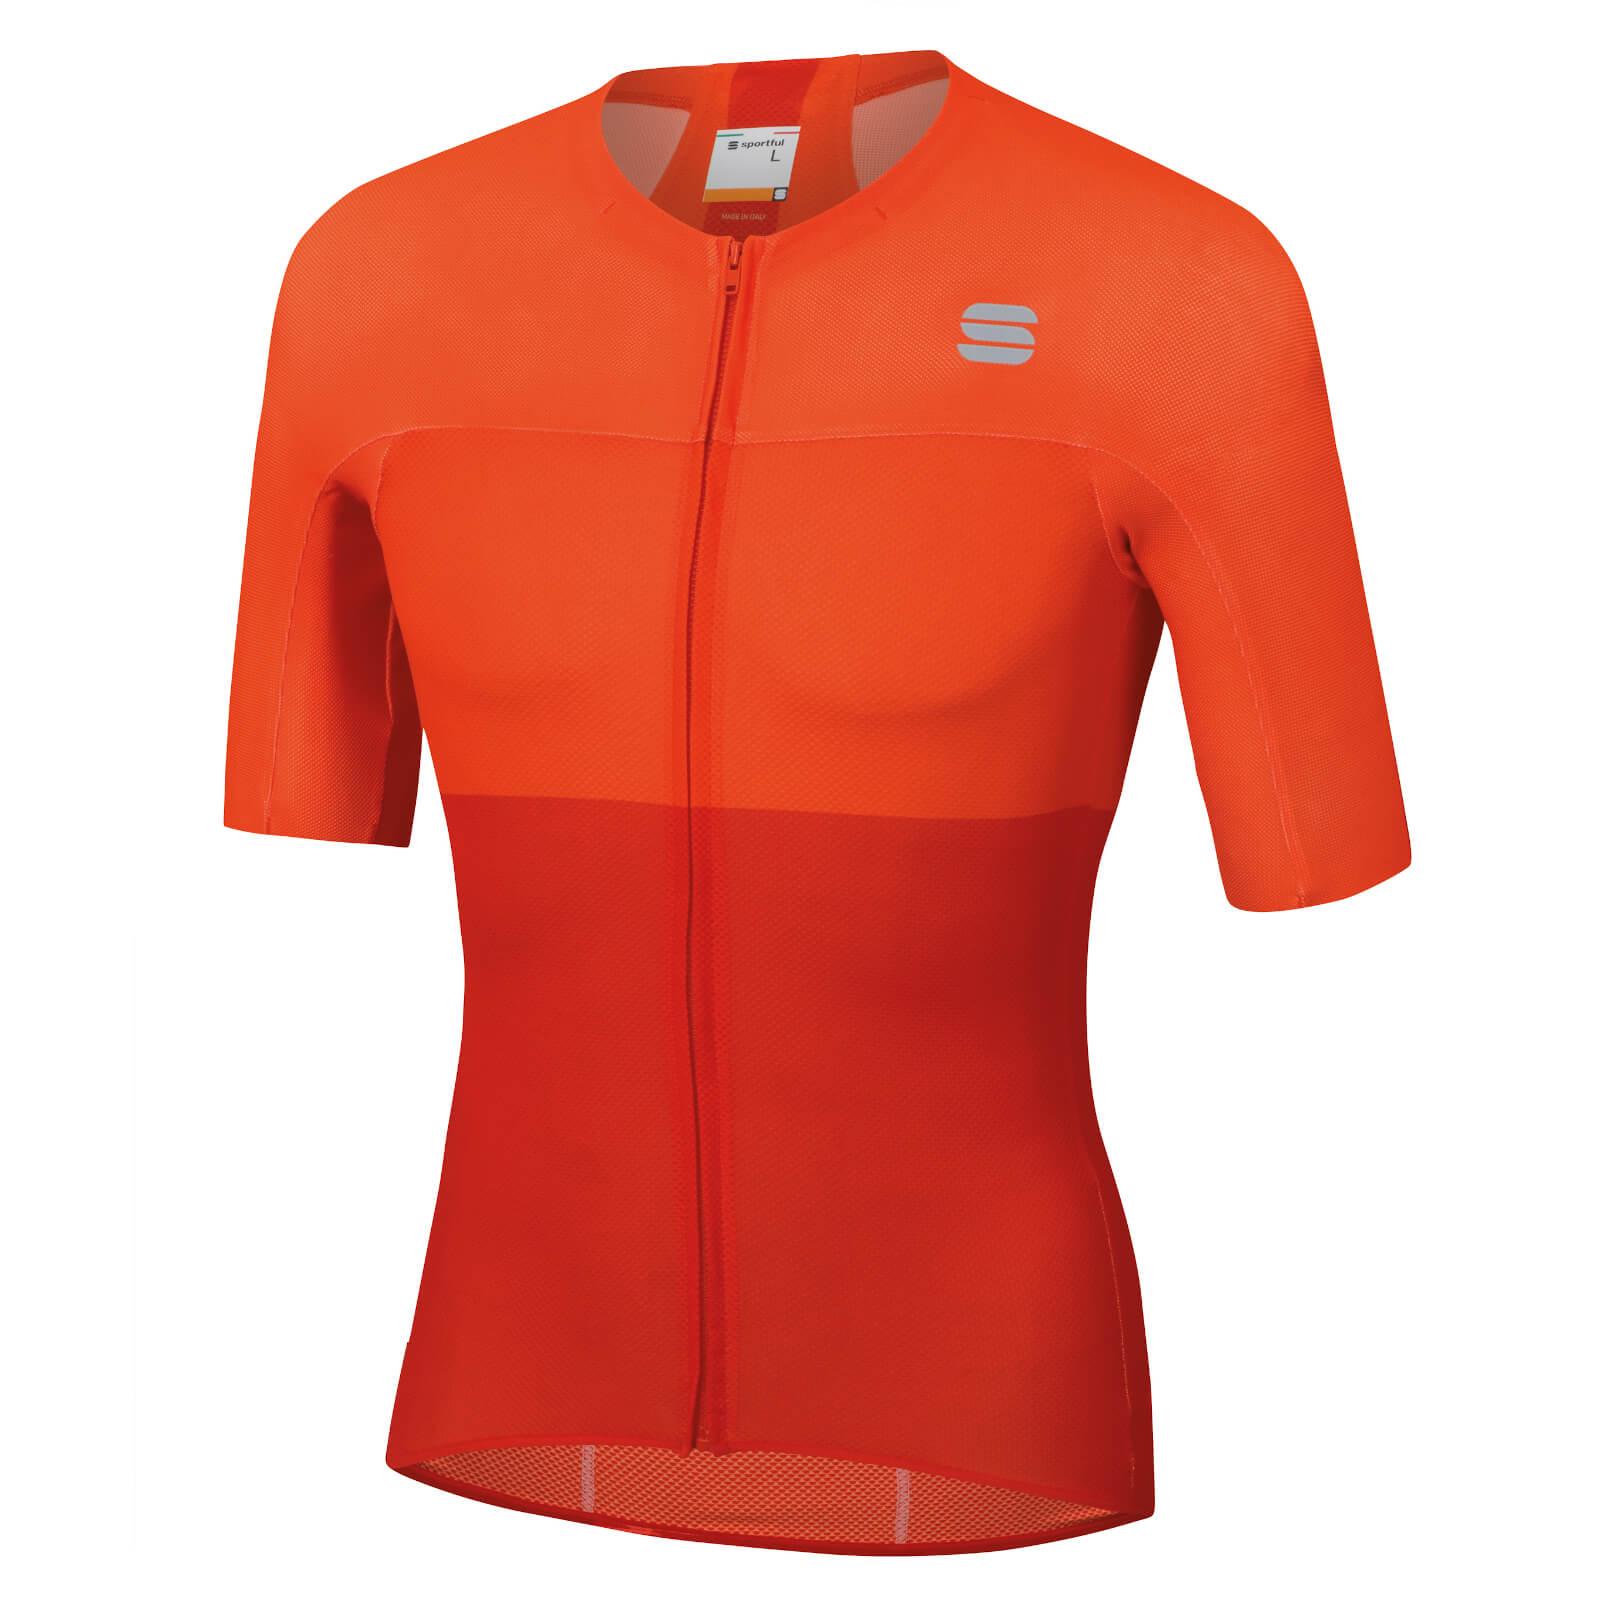 Sportful BodyFit Pro Light Jersey - XXL - Fire Red/Orange SDR